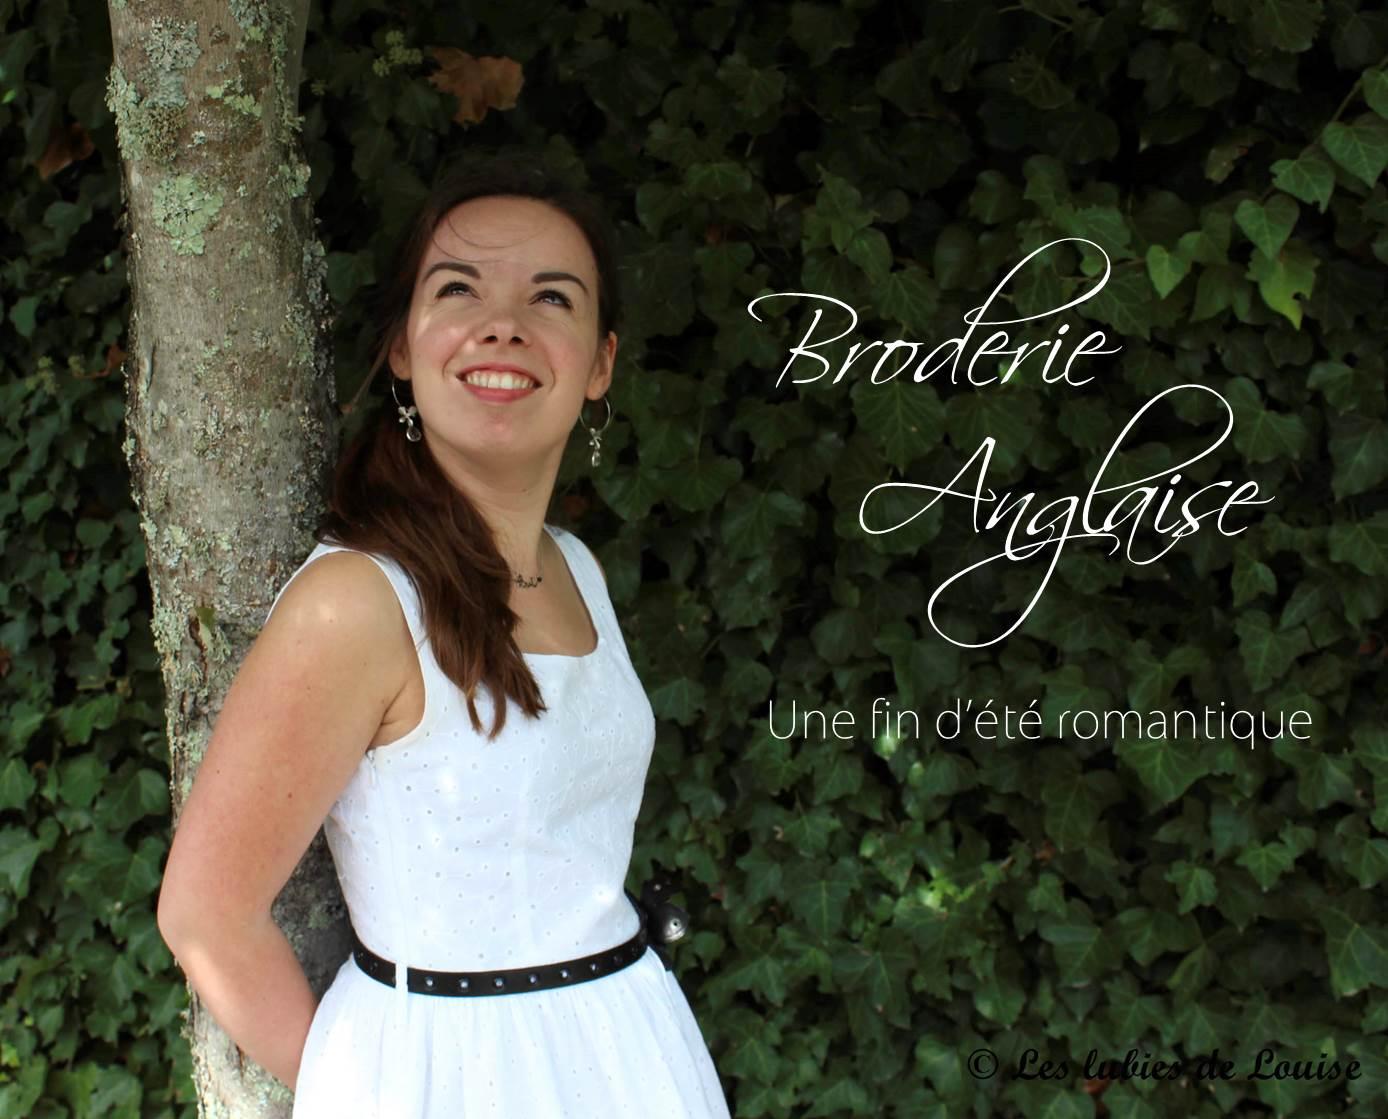 Petite robe broderie anglaise blanche - Les lubies de Louise titre